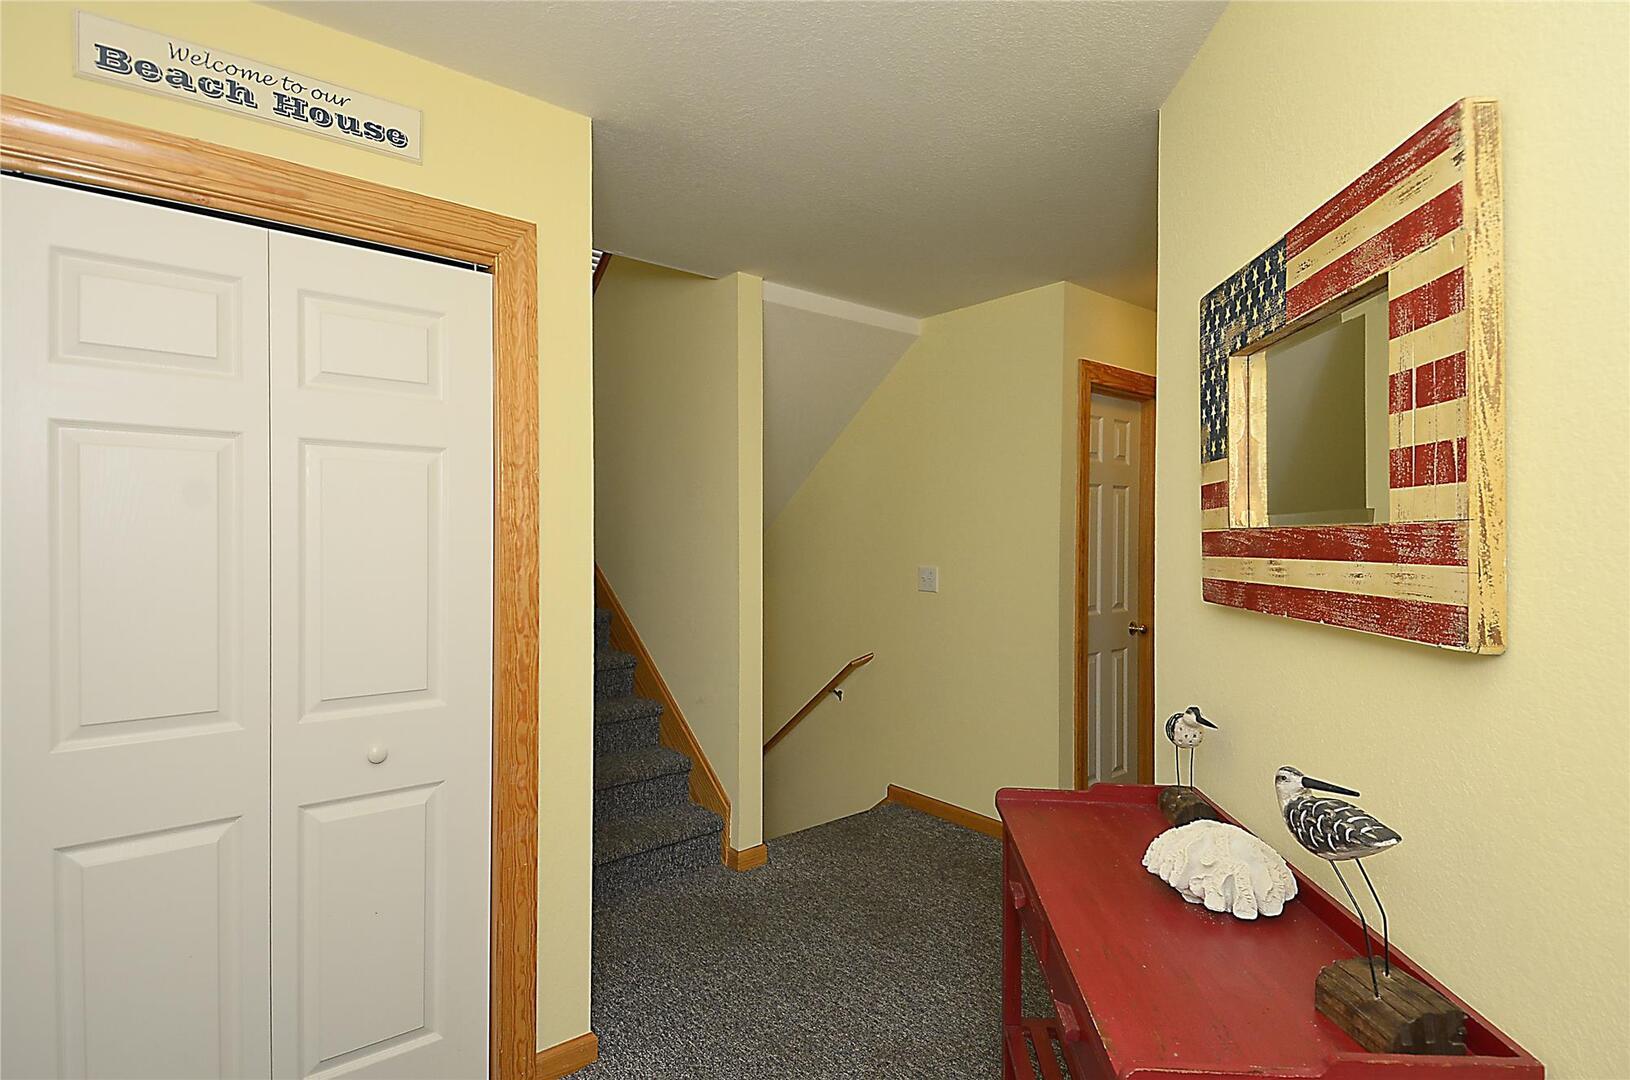 Middle Level,Foyer,